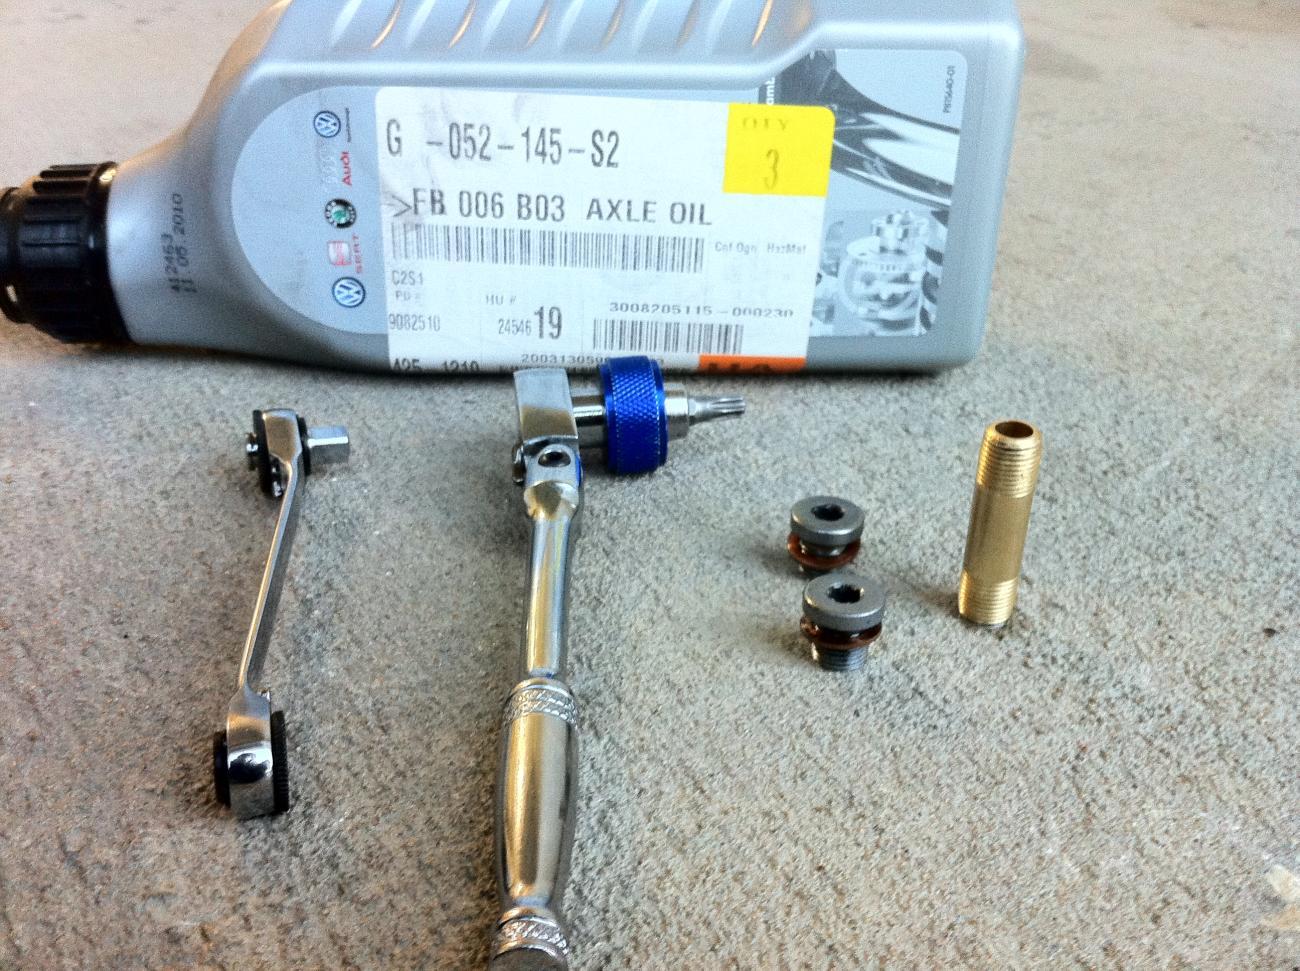 MKV R32 Rear Diff Oil Change - VW GTI Forum / VW Rabbit